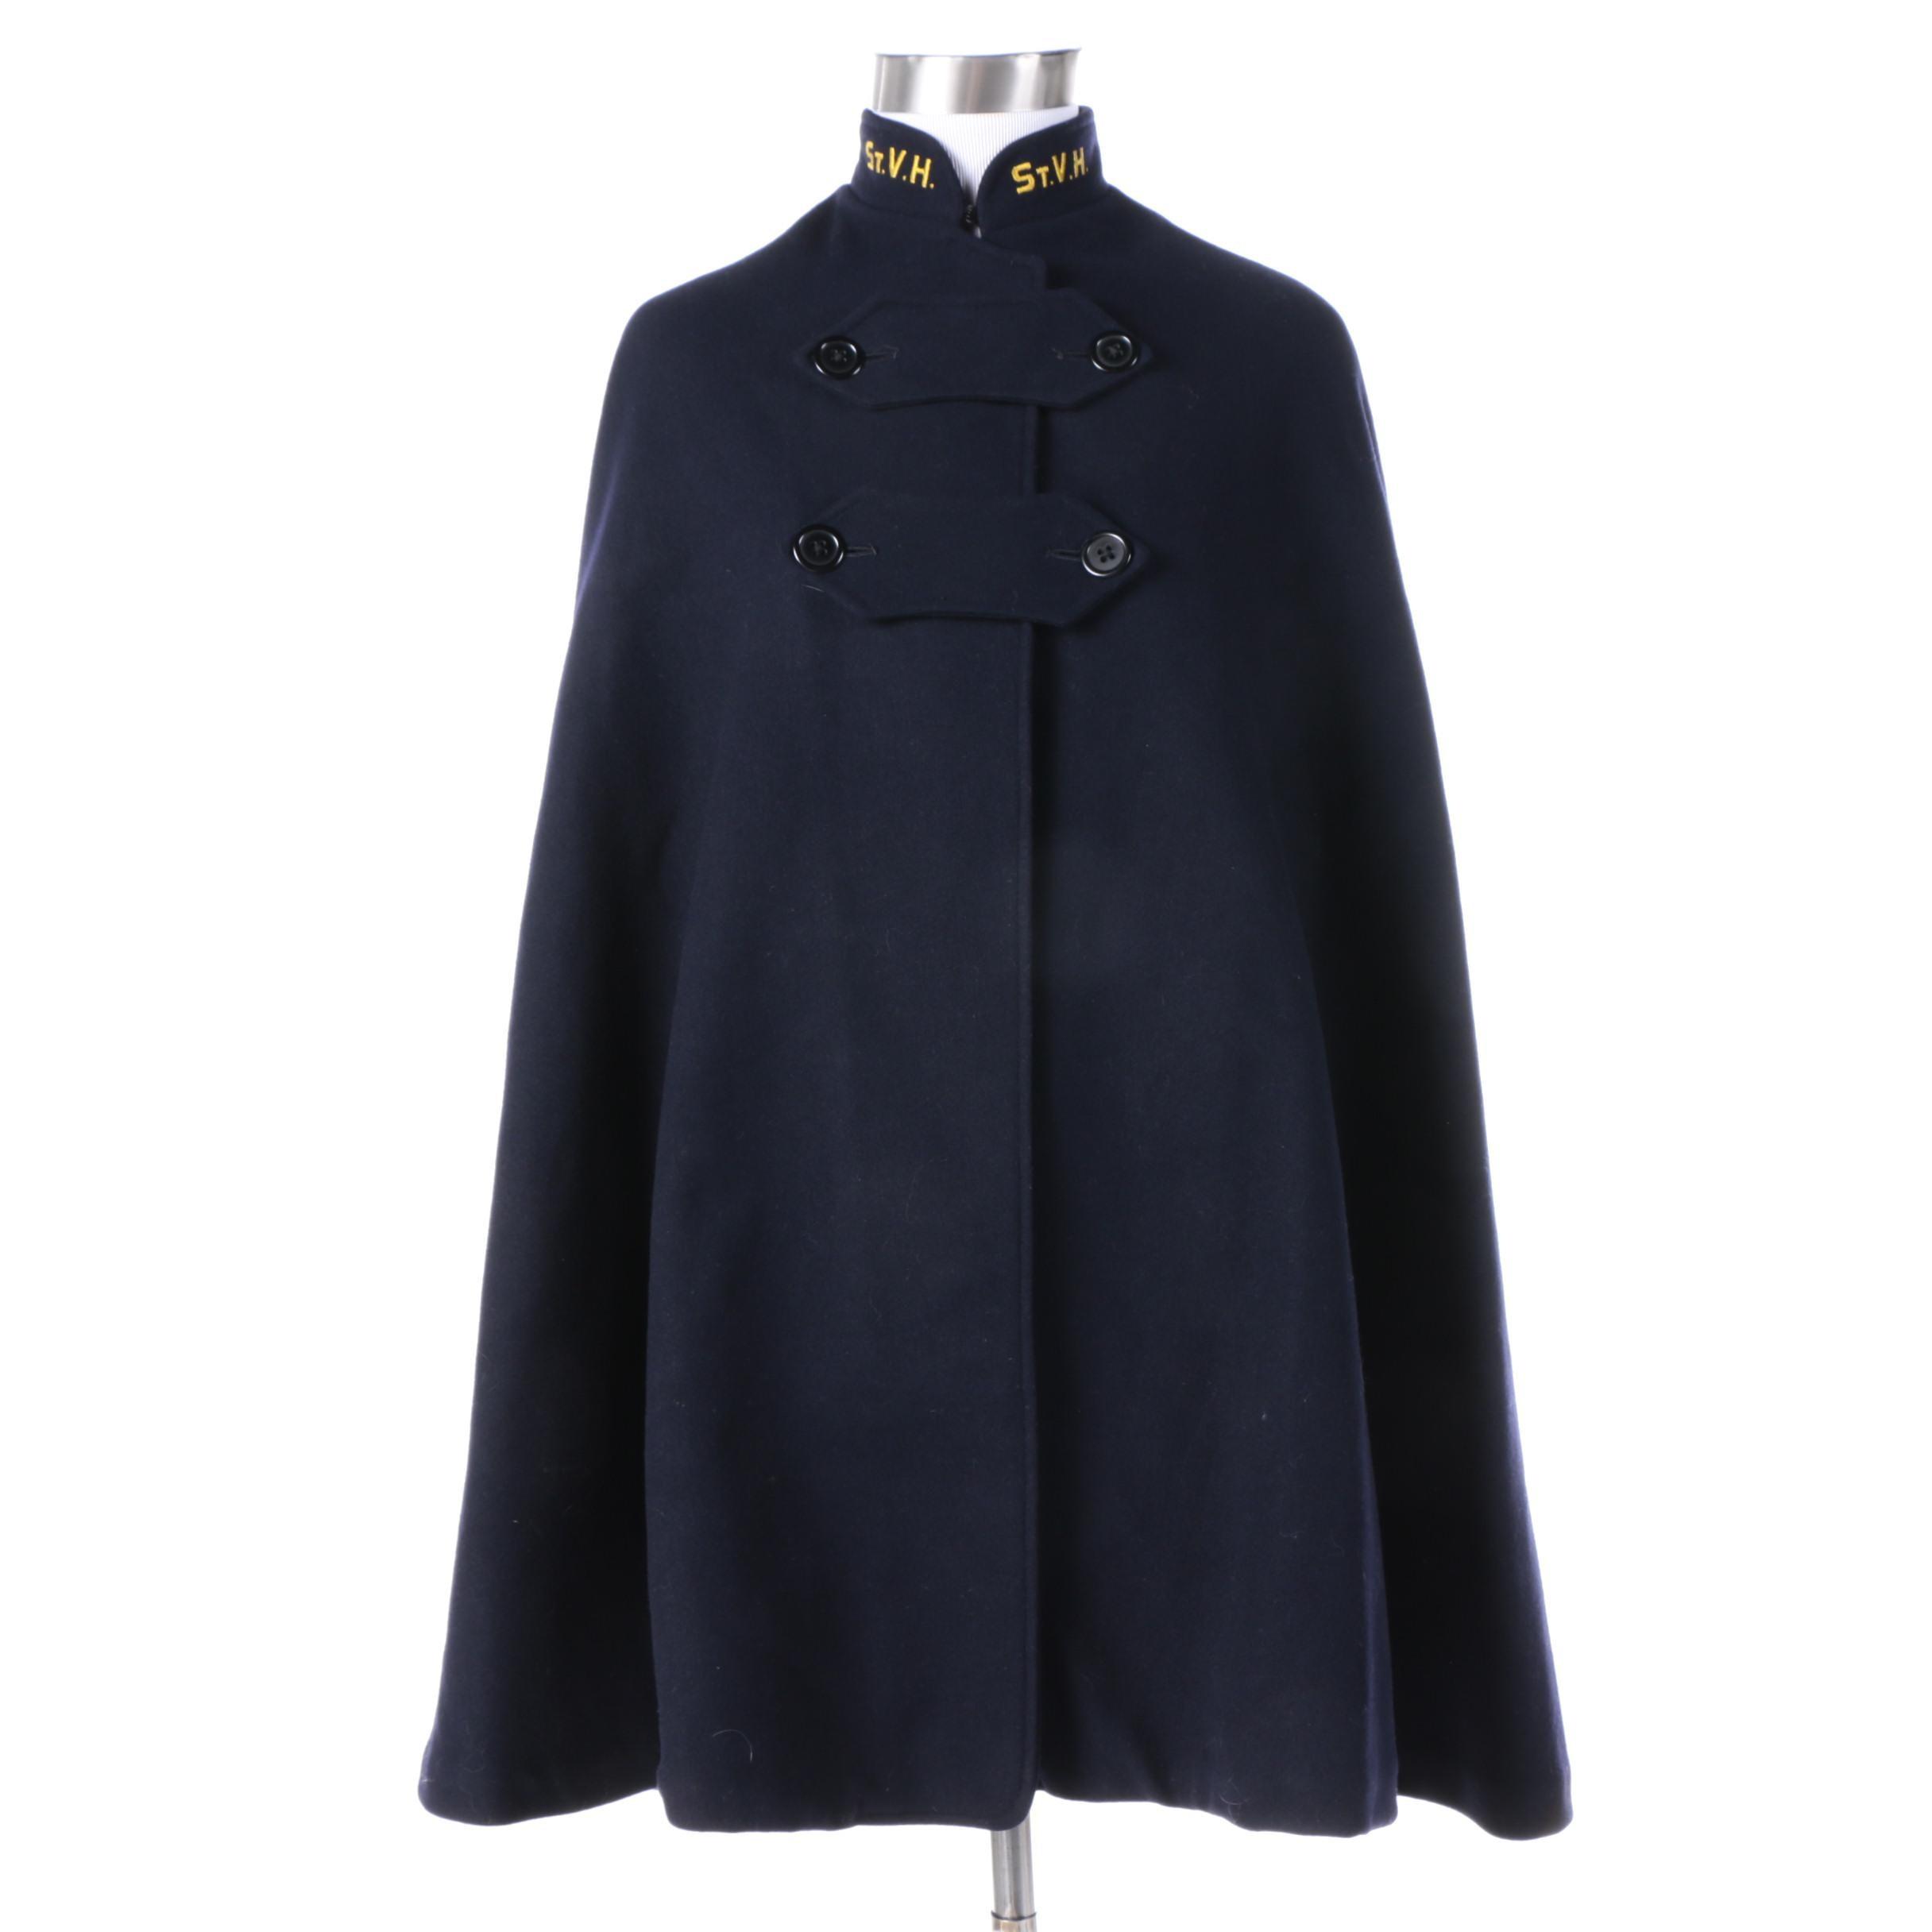 Vintage Snowhite Garment Mfg. Uniform Navy Blue Wool Cape